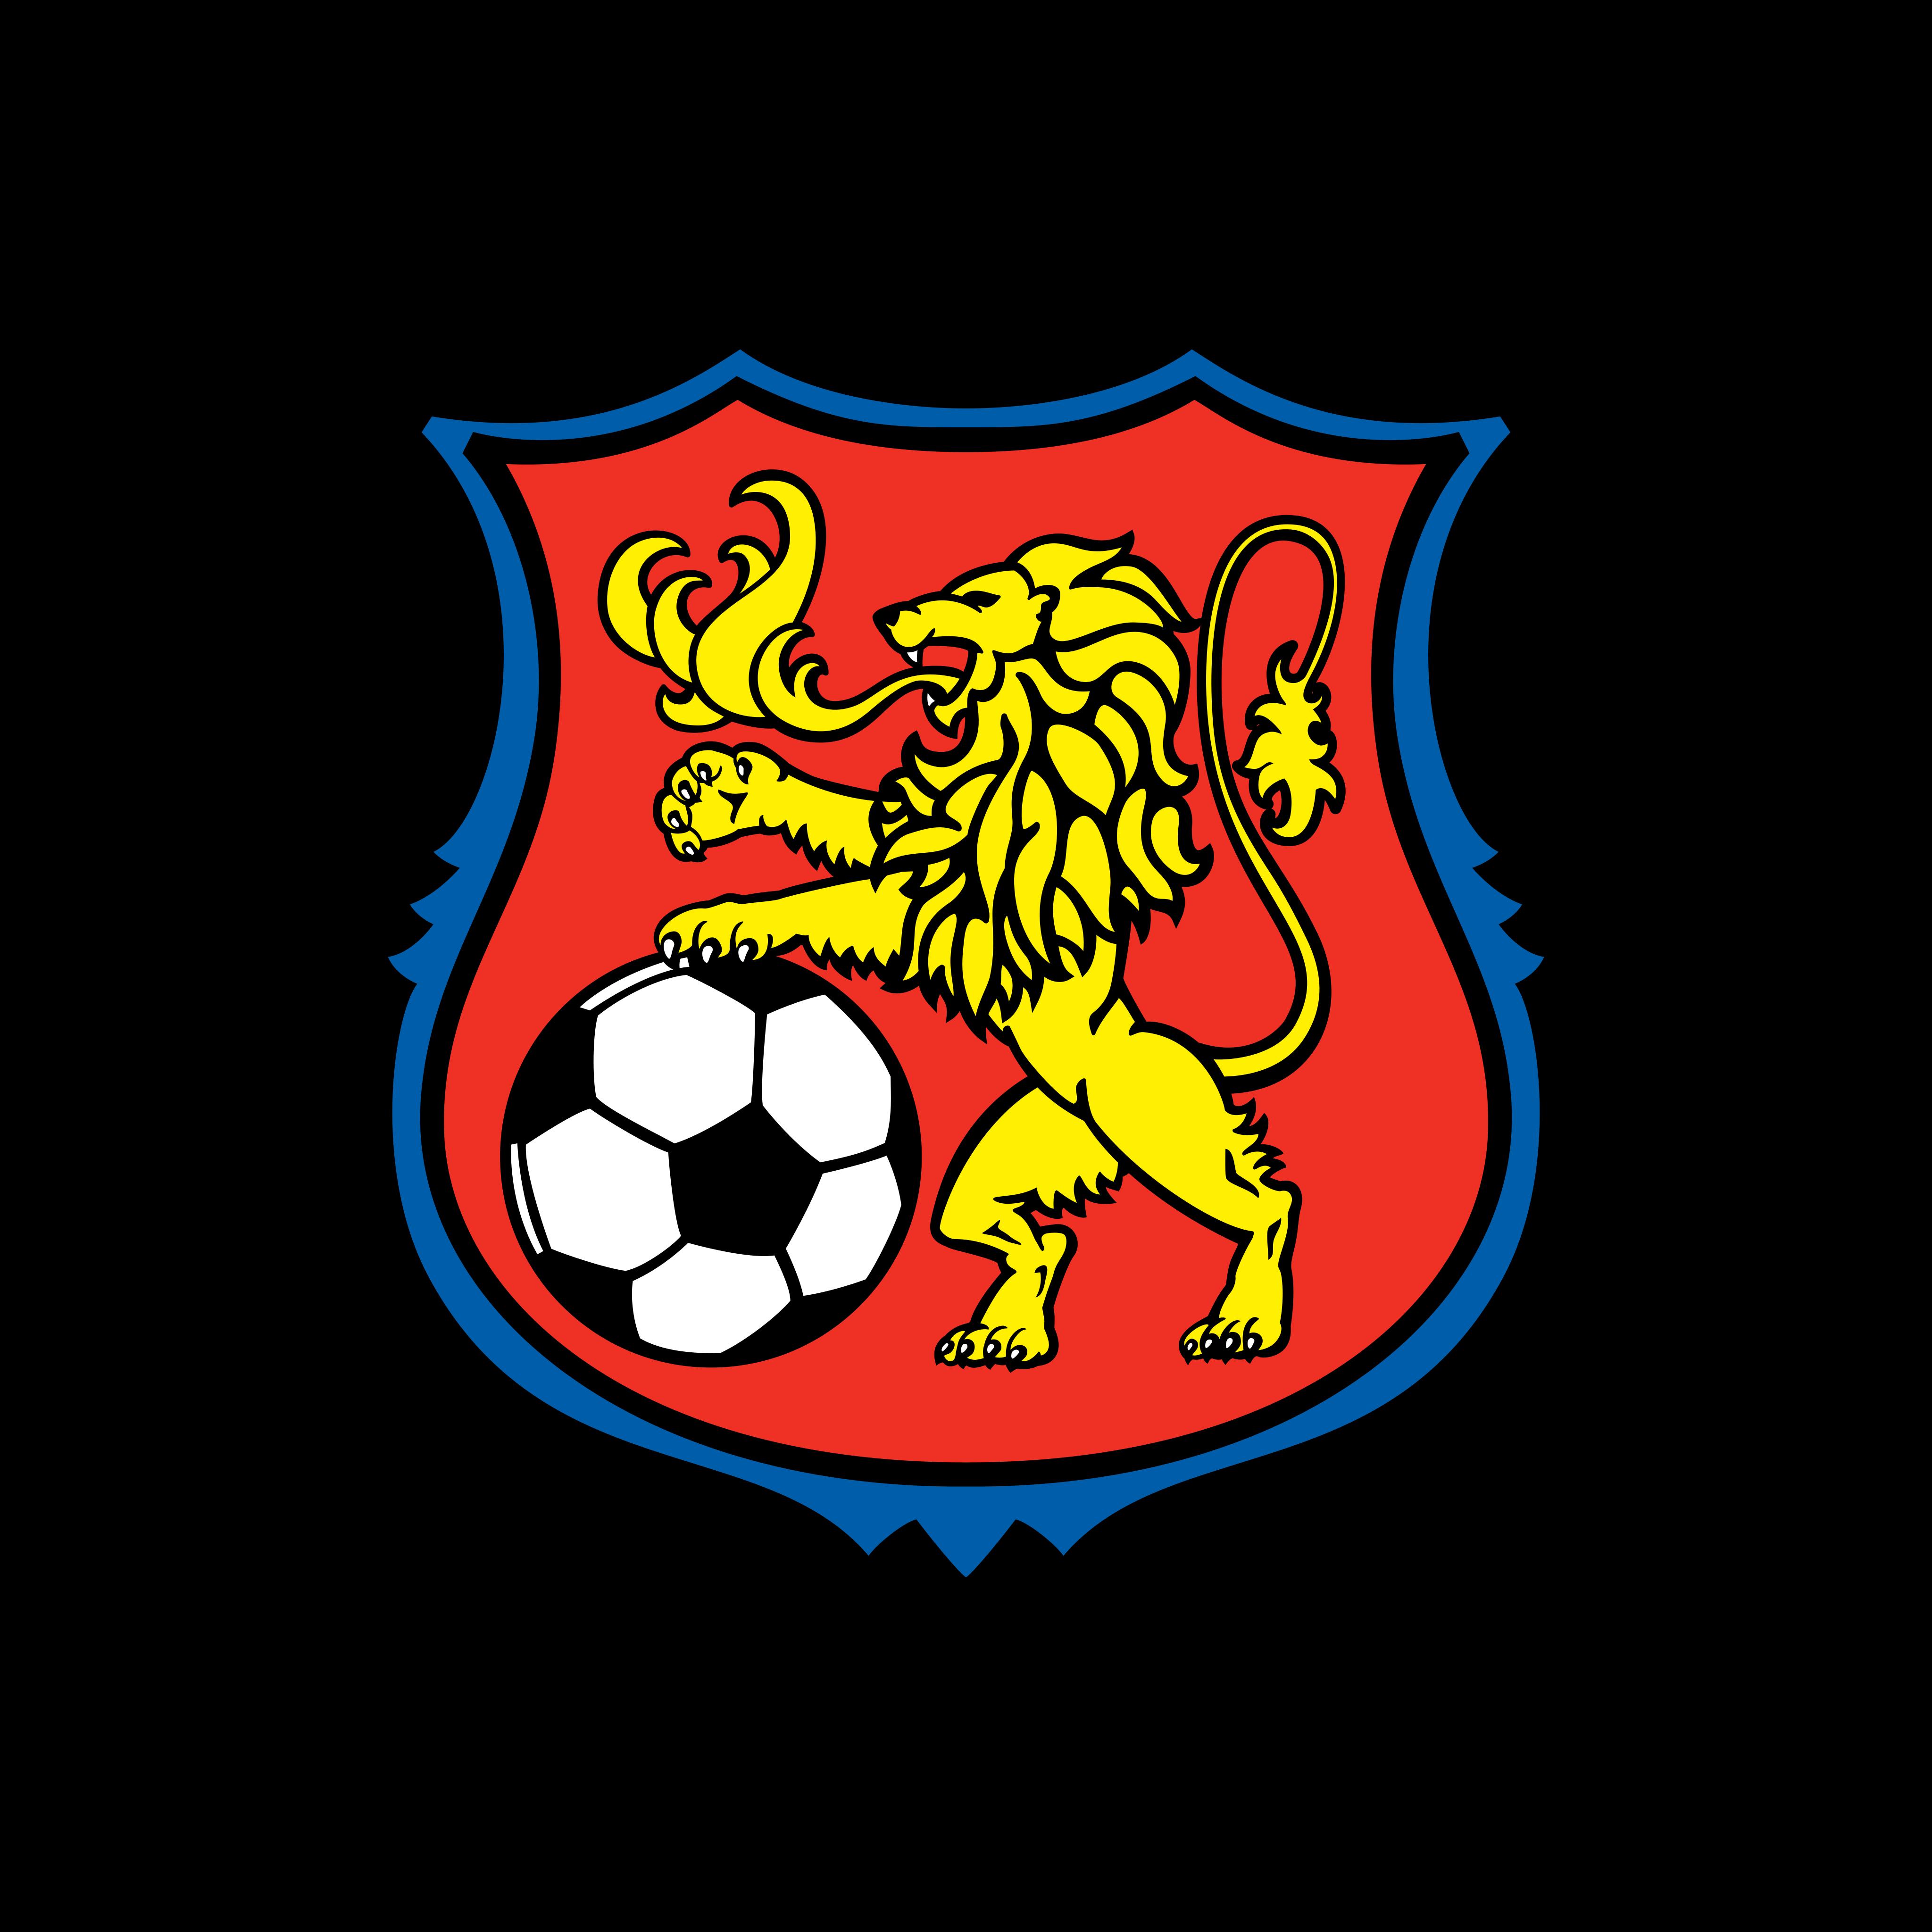 caracas fc logo 0 - Caracas FC Logo